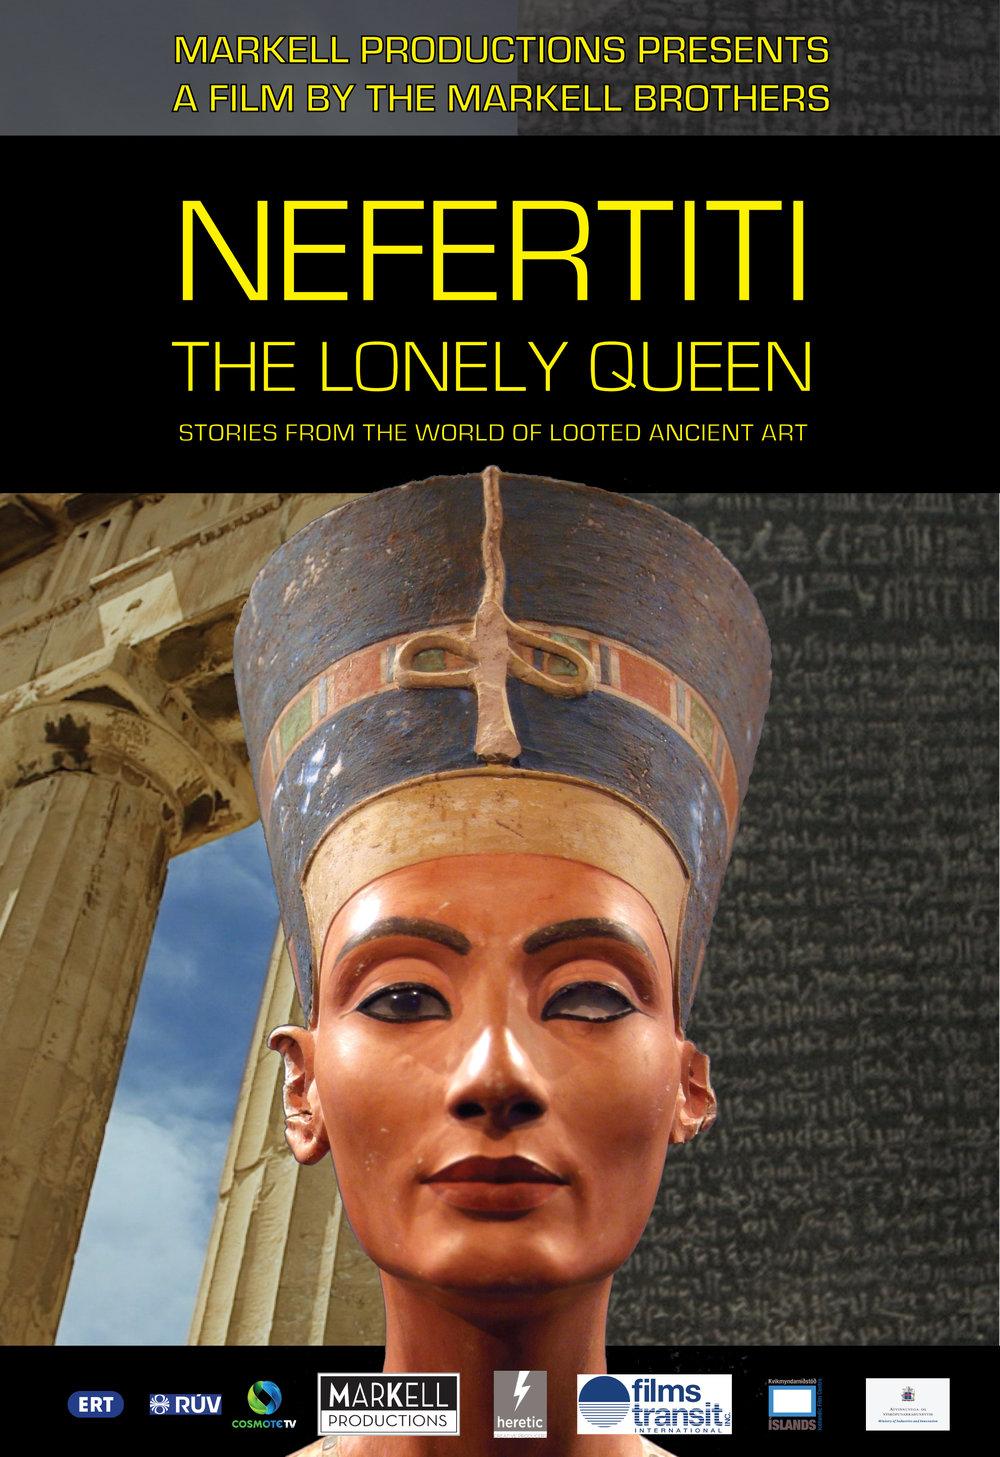 poster-nefertiti-lonely-queen.jpg